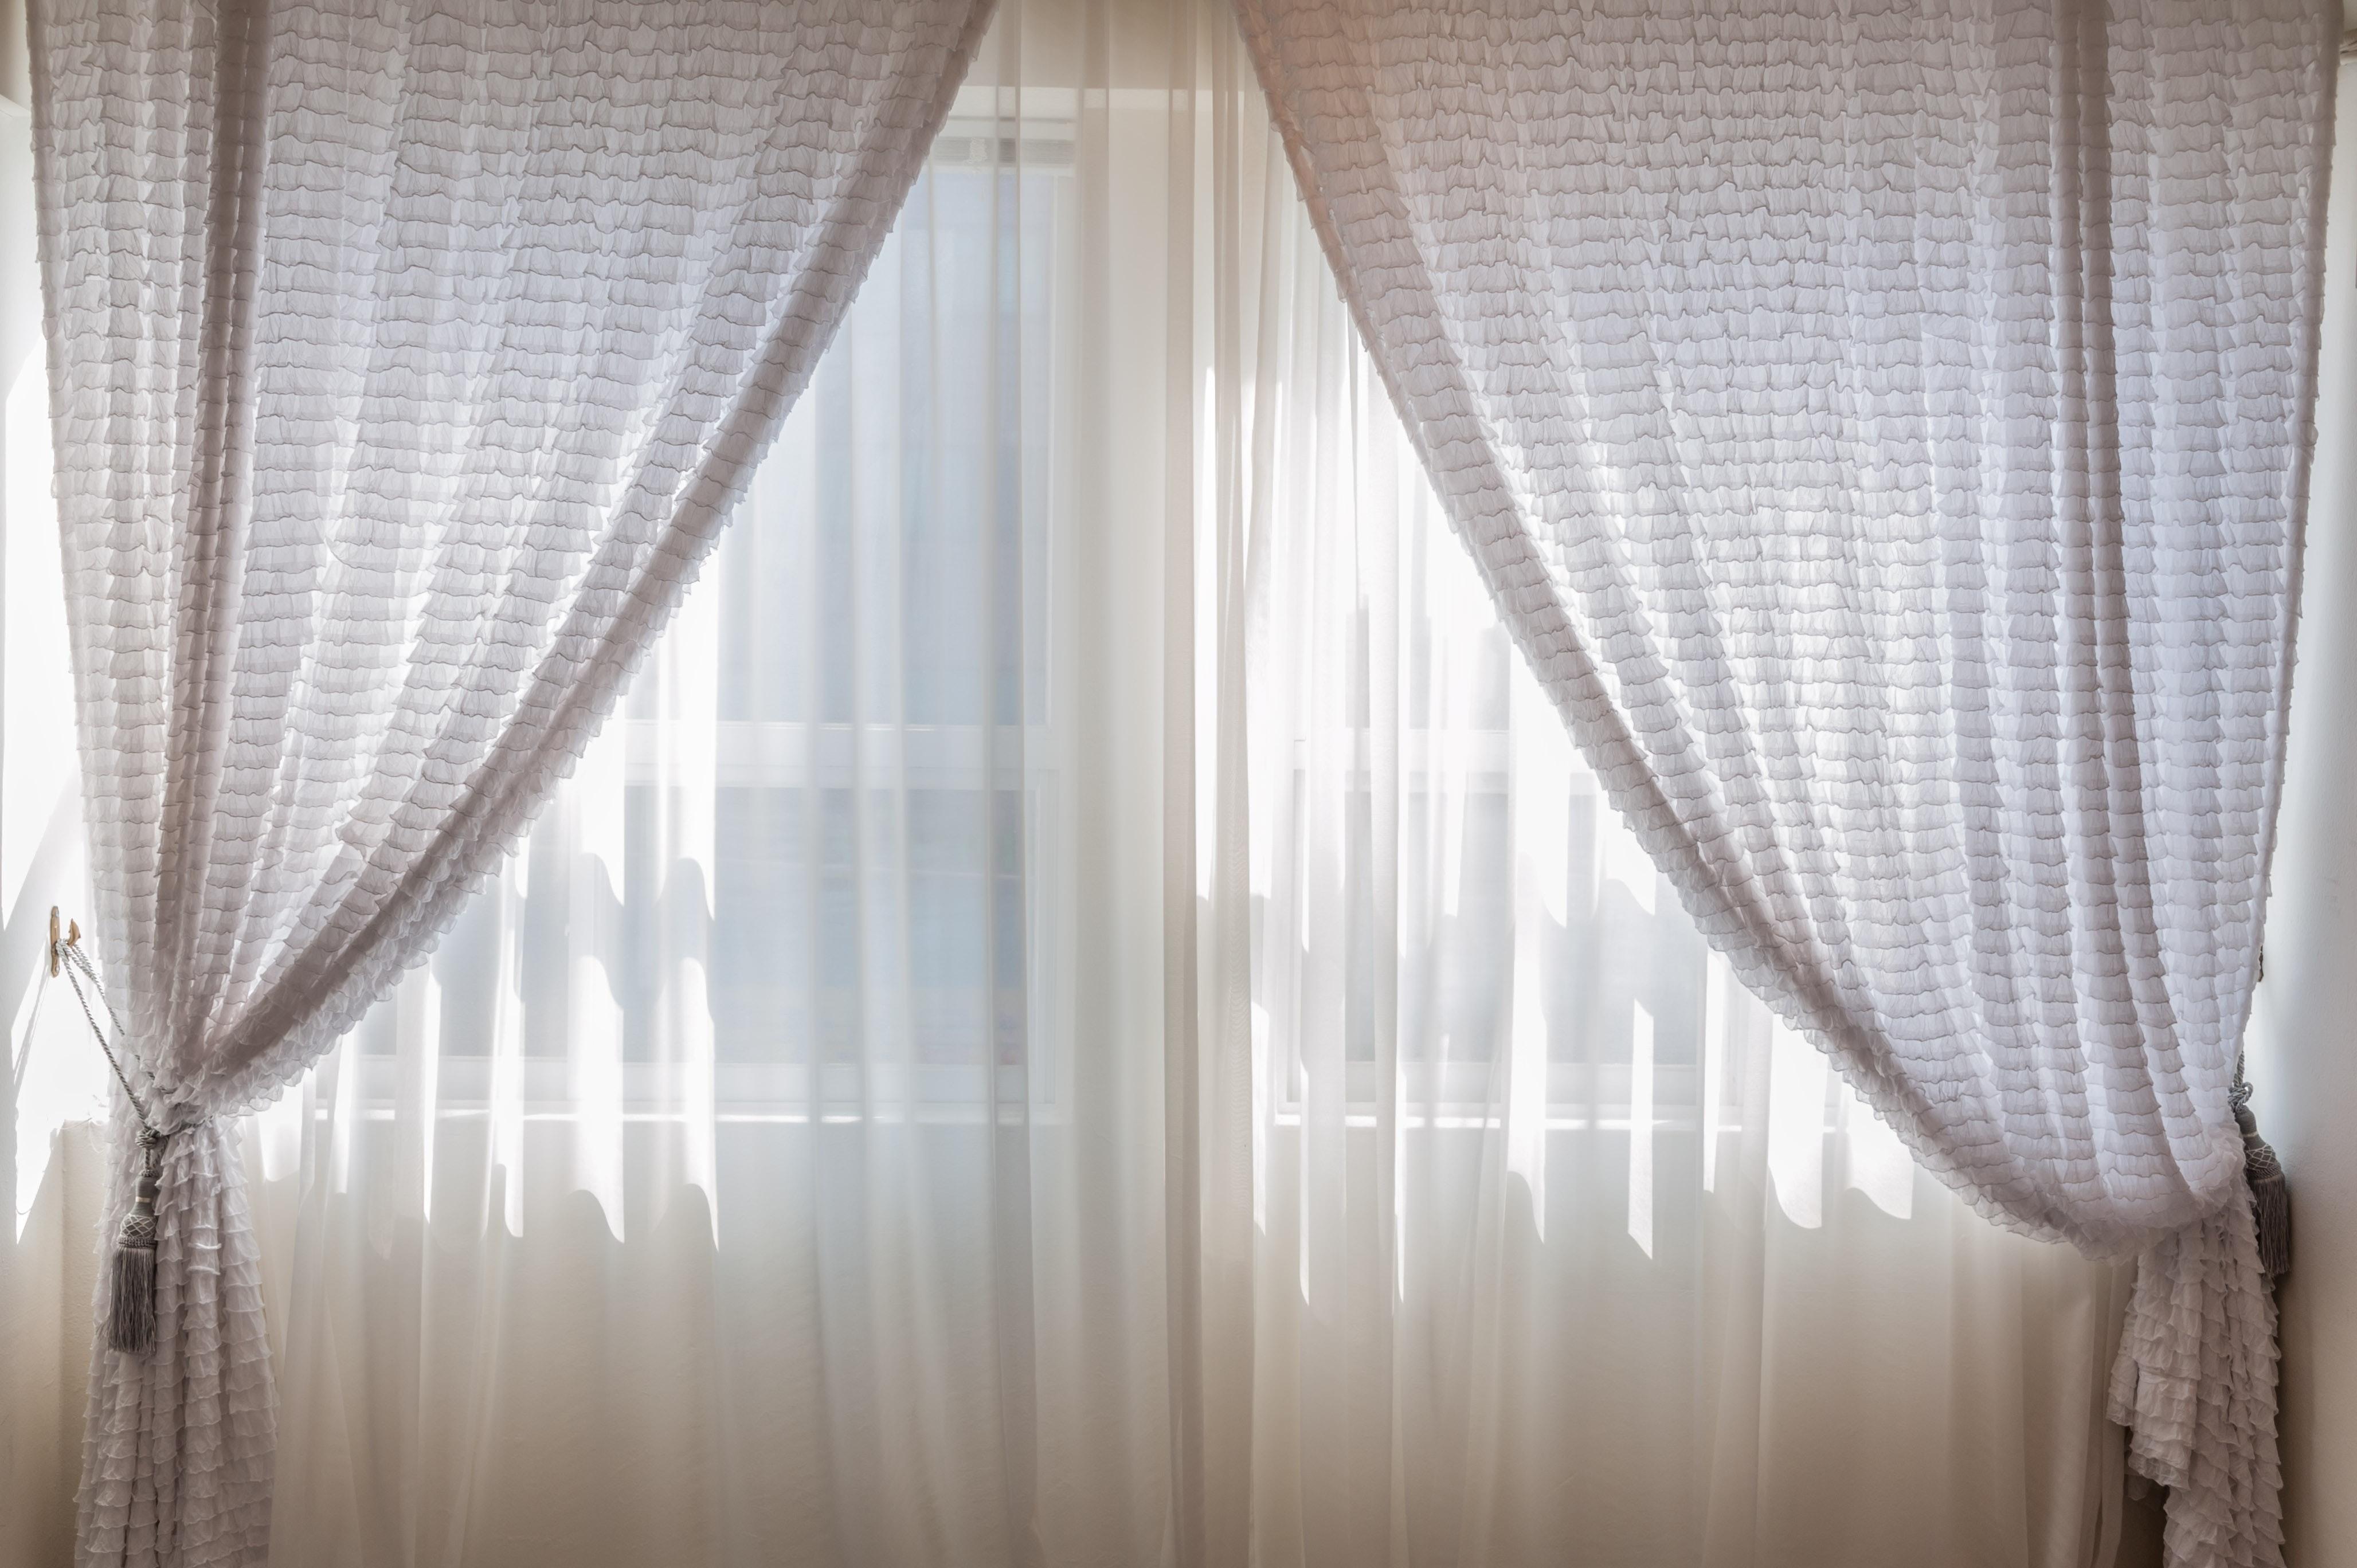 Photo Of White Curtains 183 Free Stock Photo